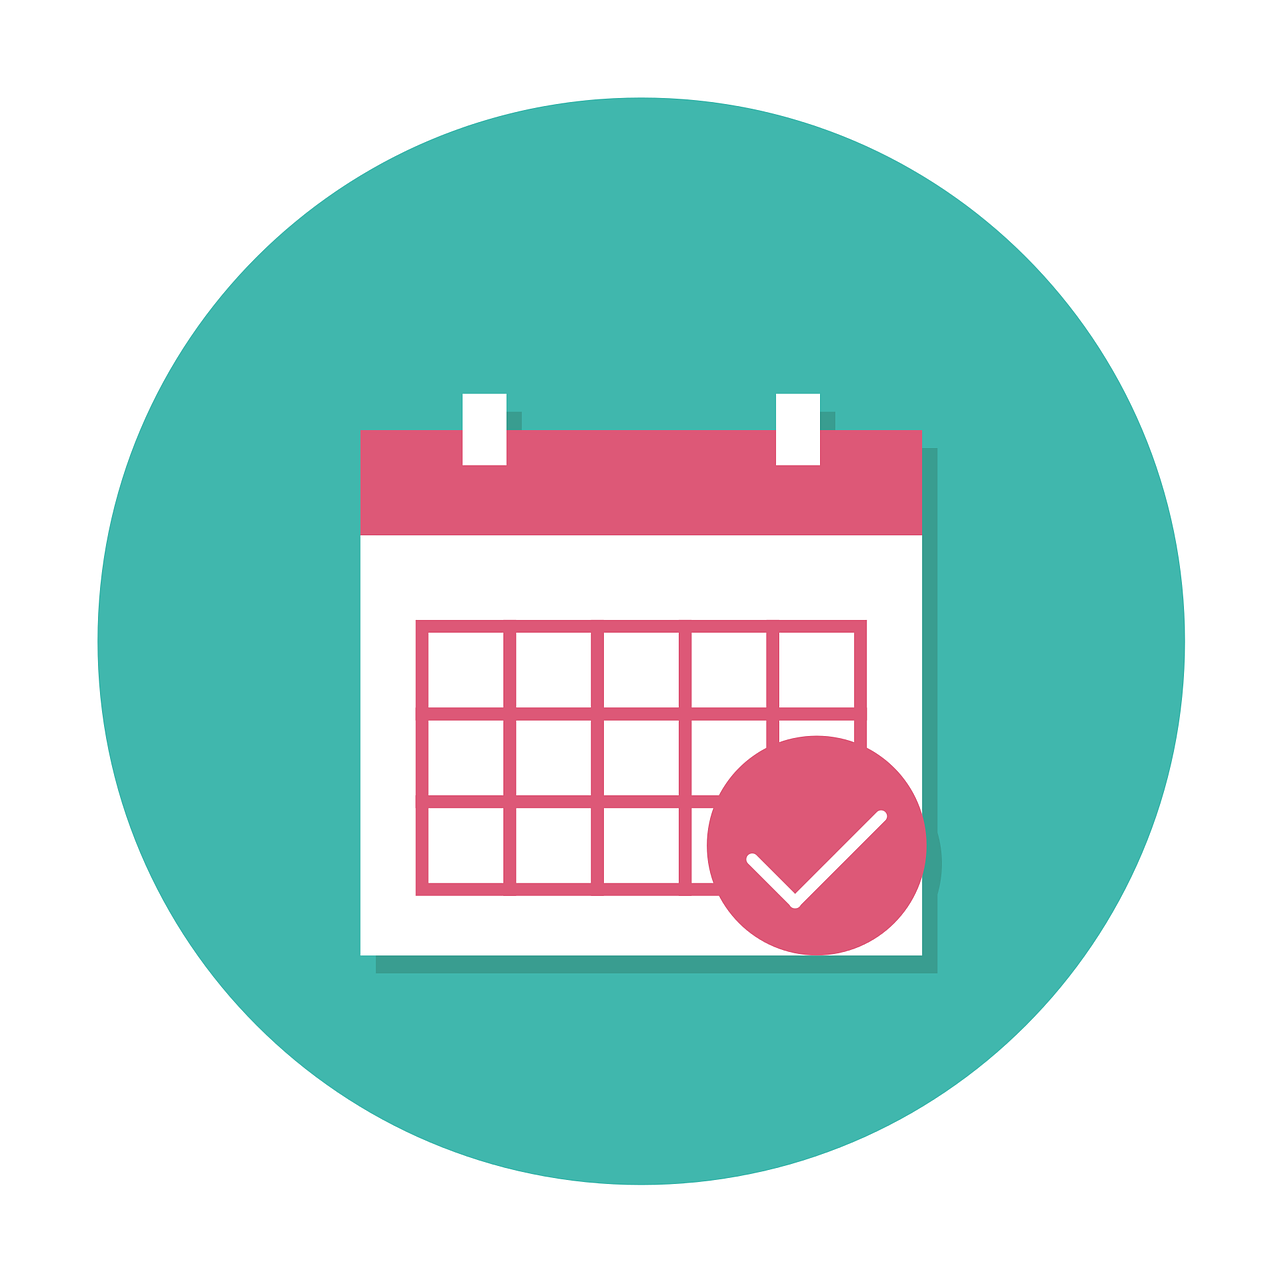 Calendario Scolastico 2020 Lombardia.Calendario Scolastico Ic Via Mariani Lissone